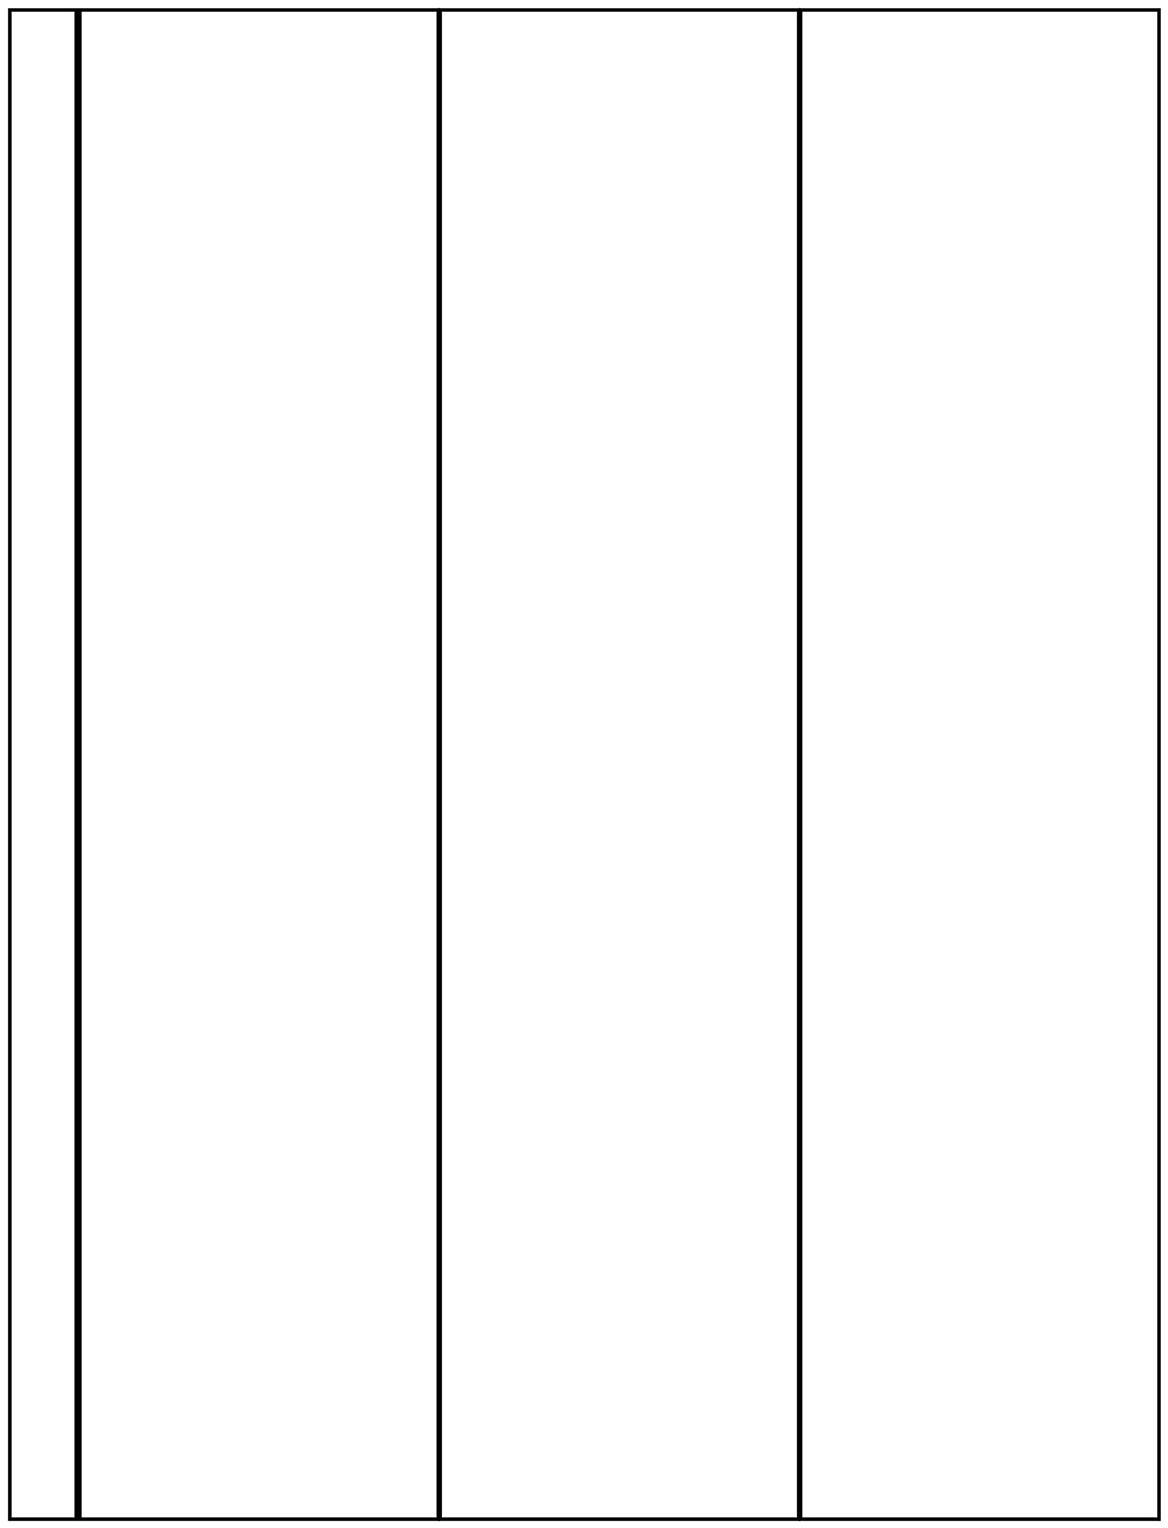 A4 Sleeves 3-Pocket (Vertical) - Pack of 10